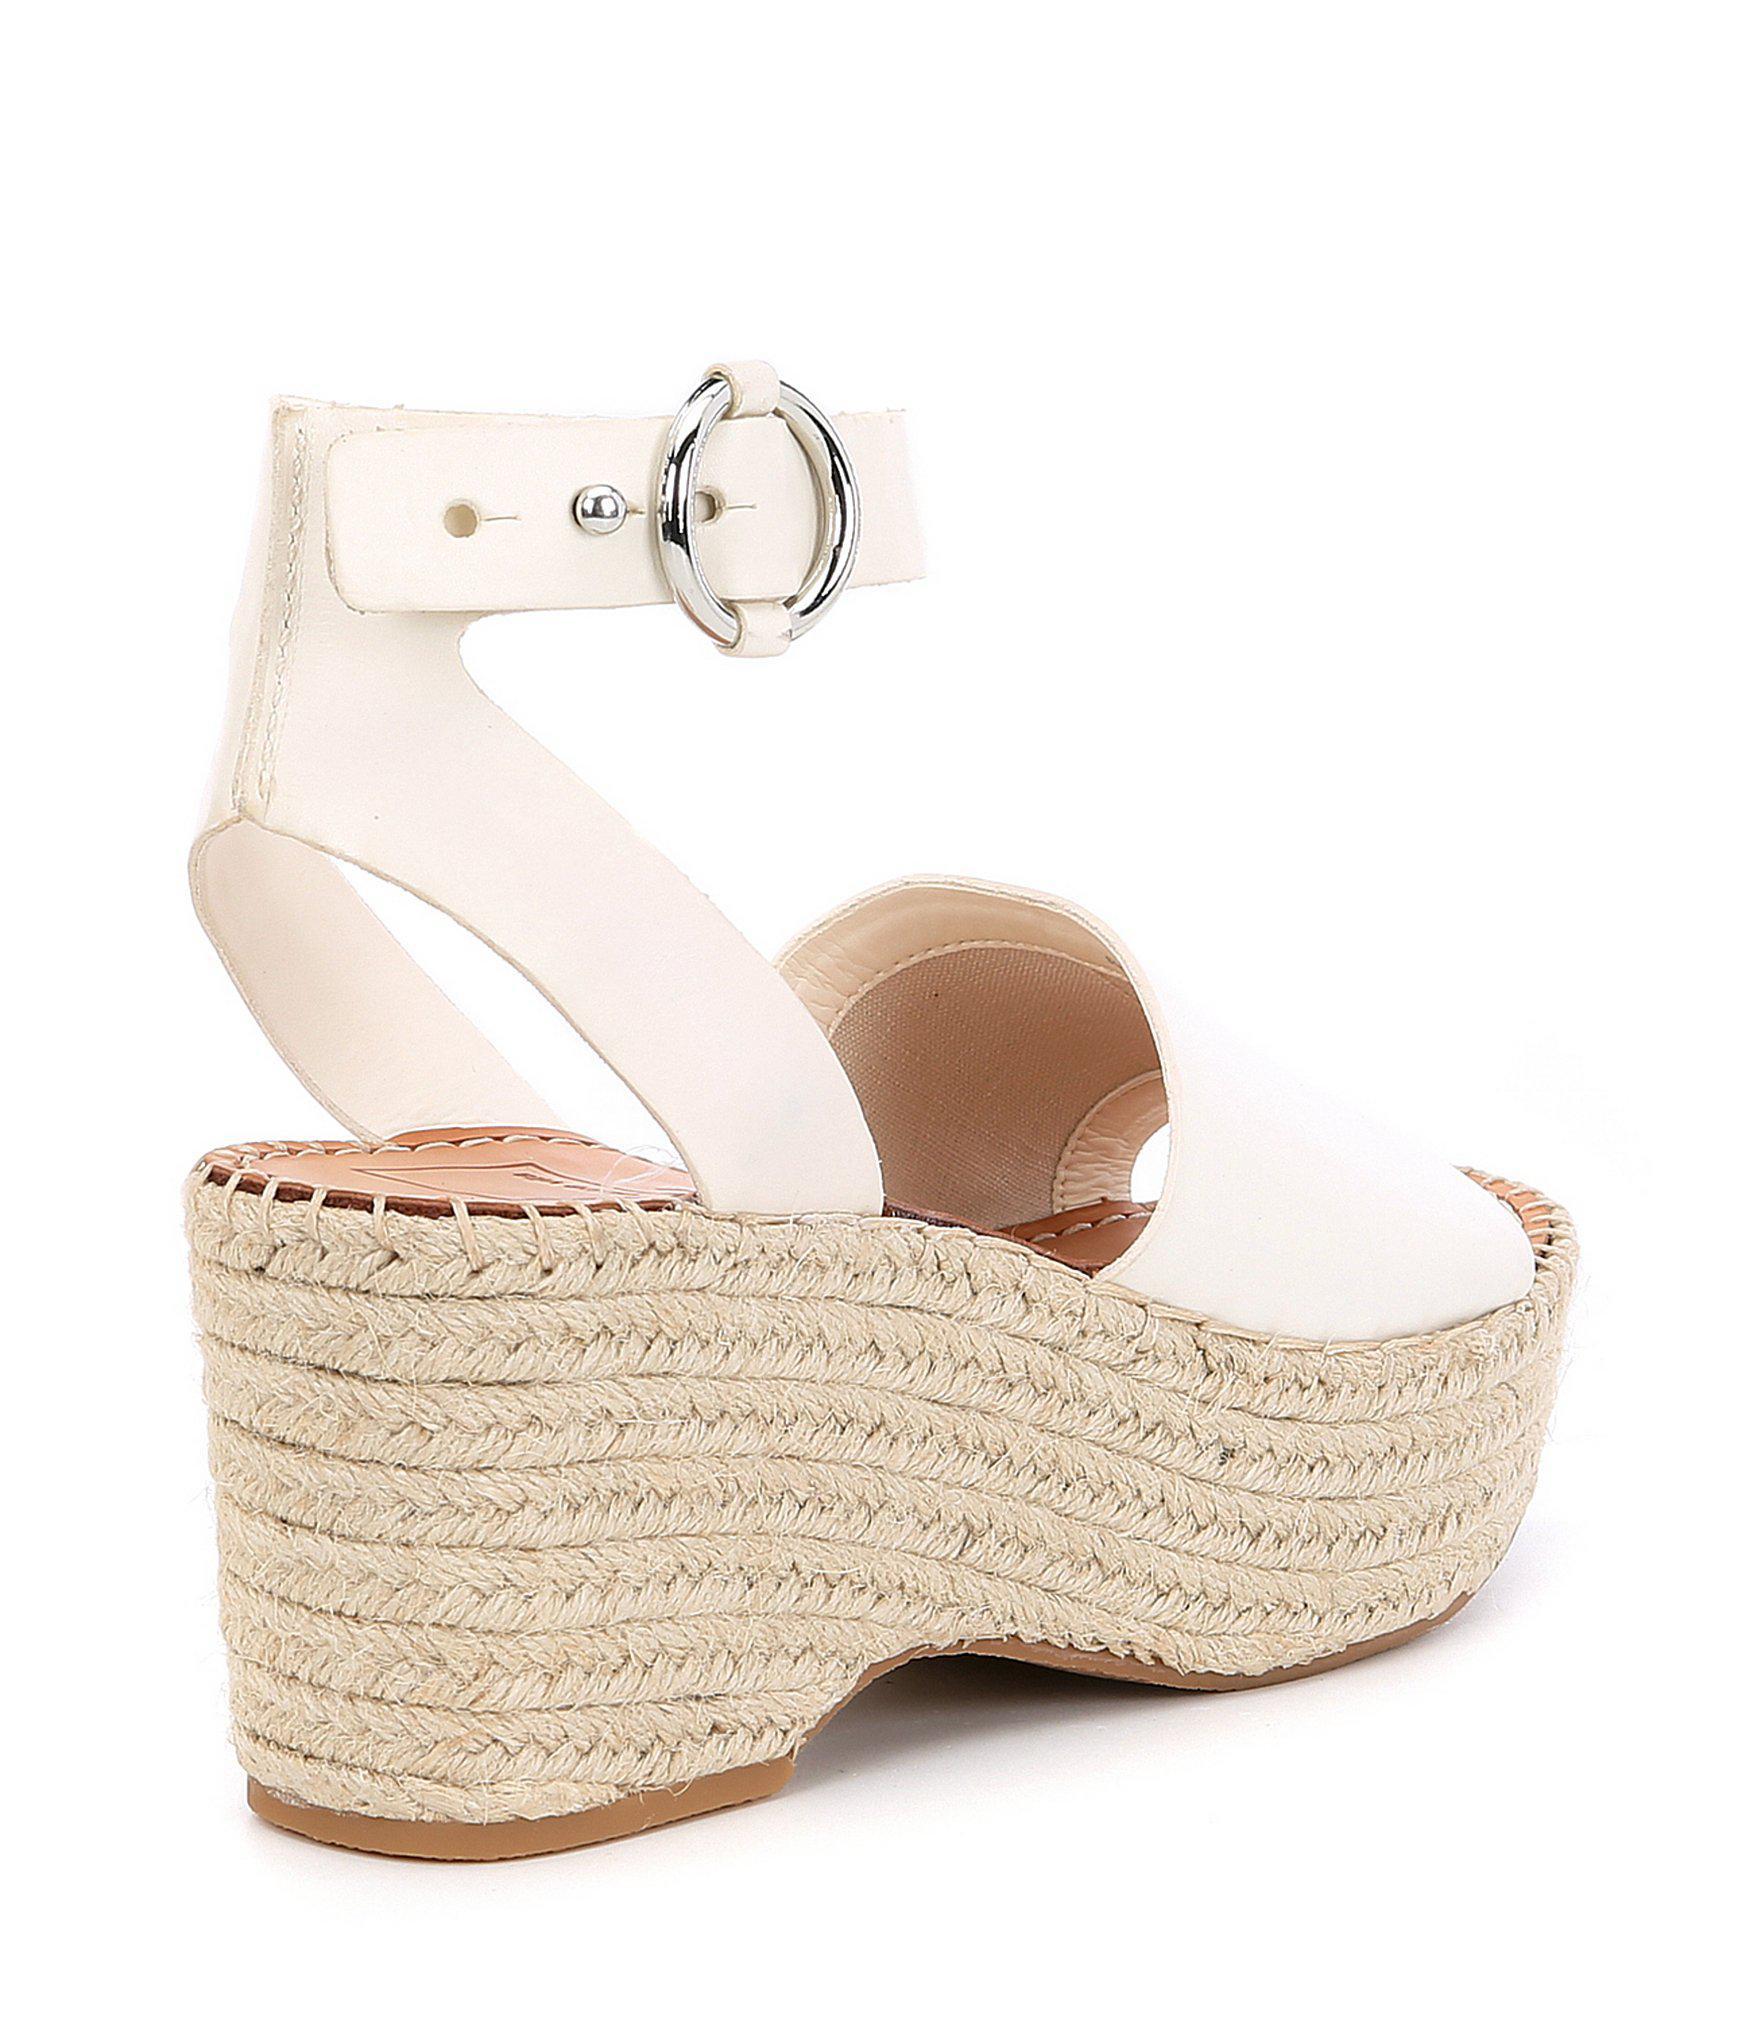 4a45e3dab41 Dolce Vita - White Lesly Leather Platform Espadrille Sandals - Lyst. View  fullscreen